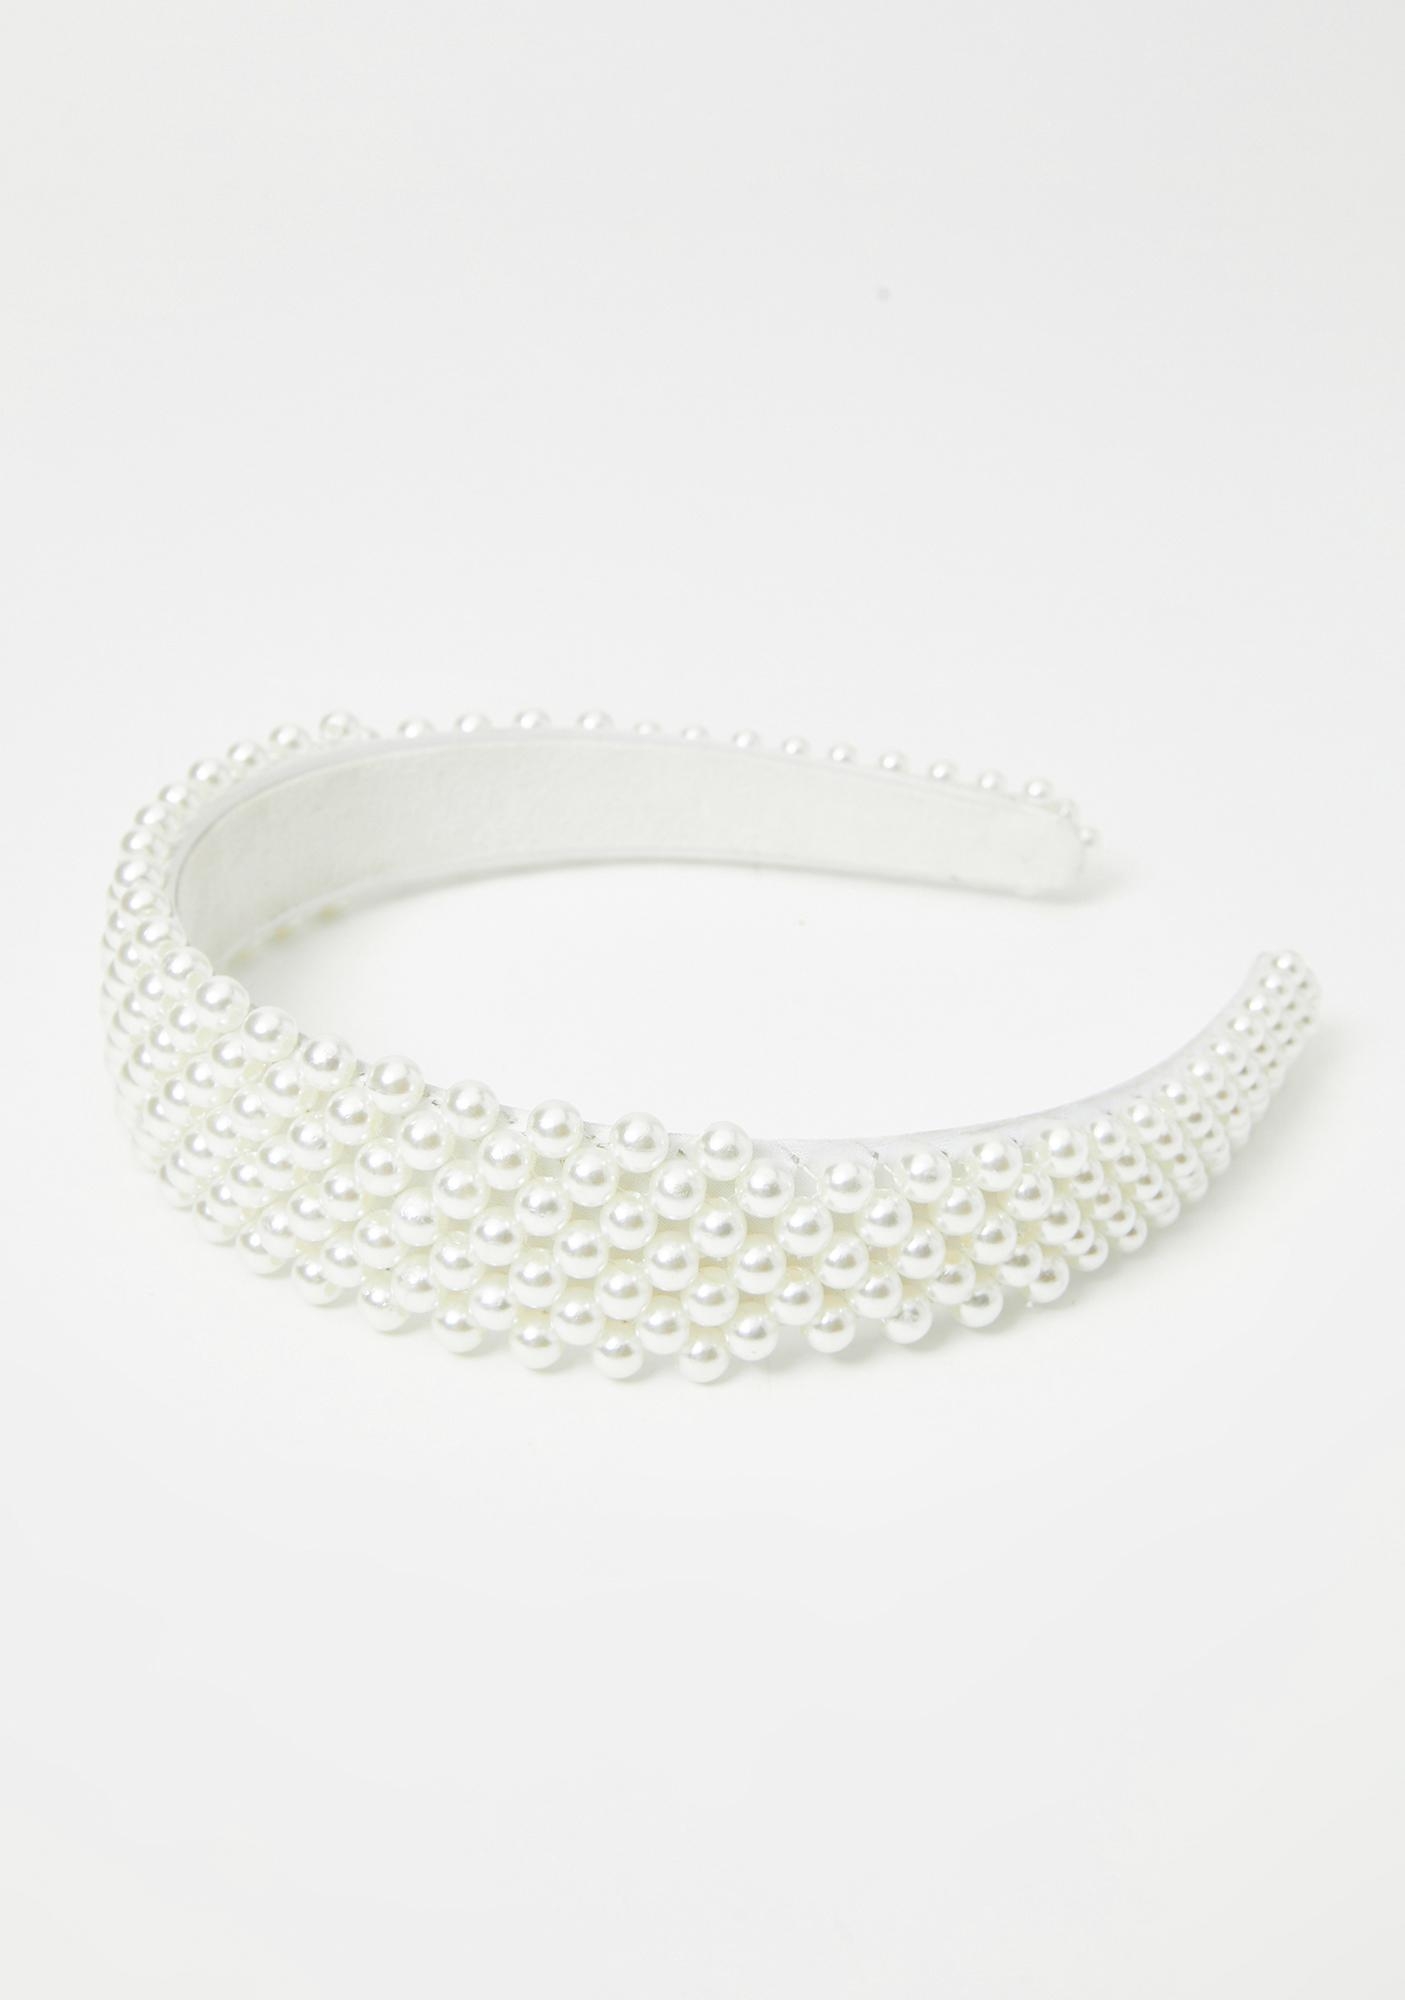 Chaotic Cotillion Pearl Headband